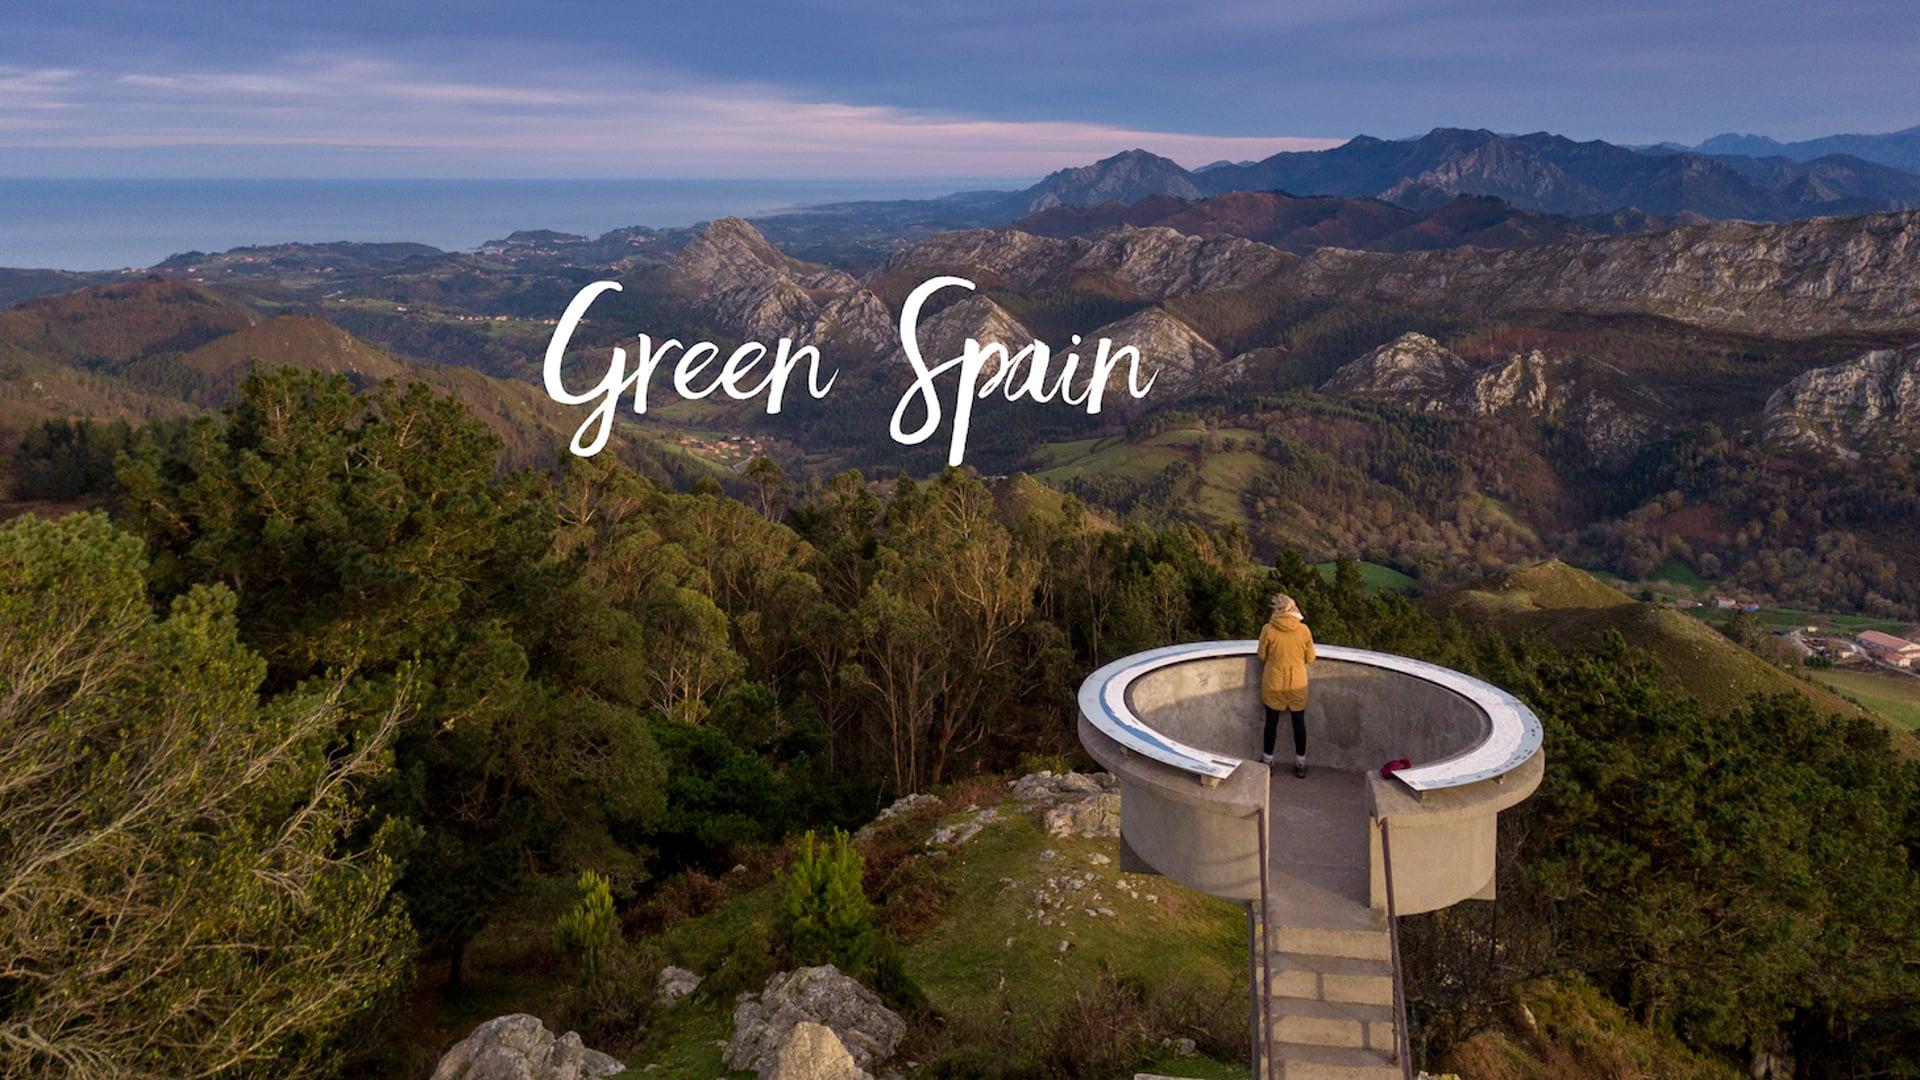 Green Spain